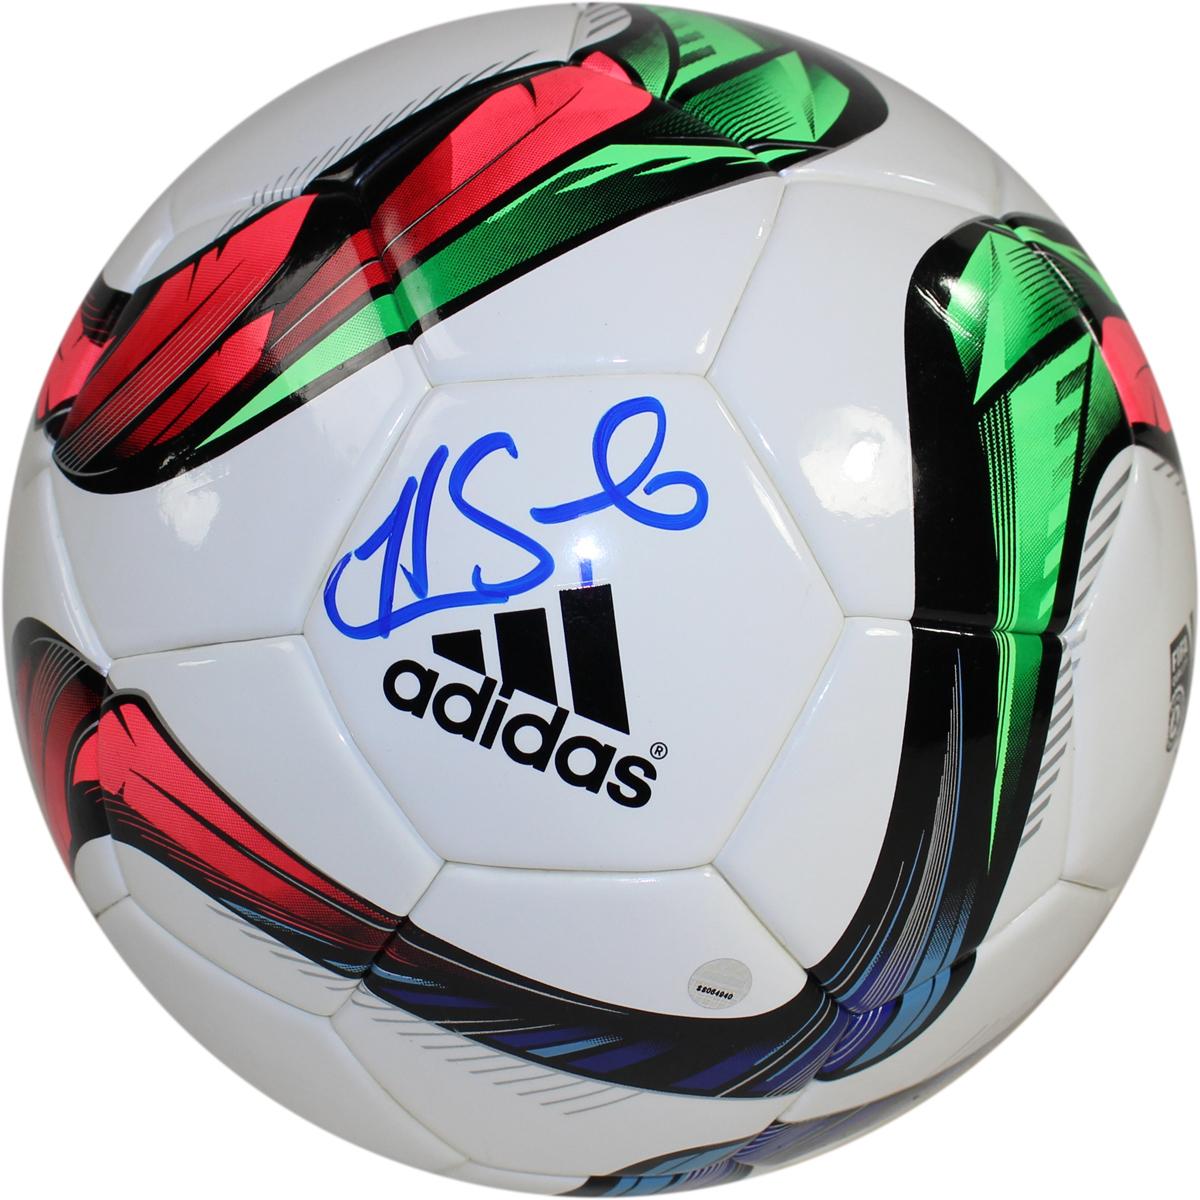 cheap>2015 world cup soccer ball,adidas seeley mid,adidas ...